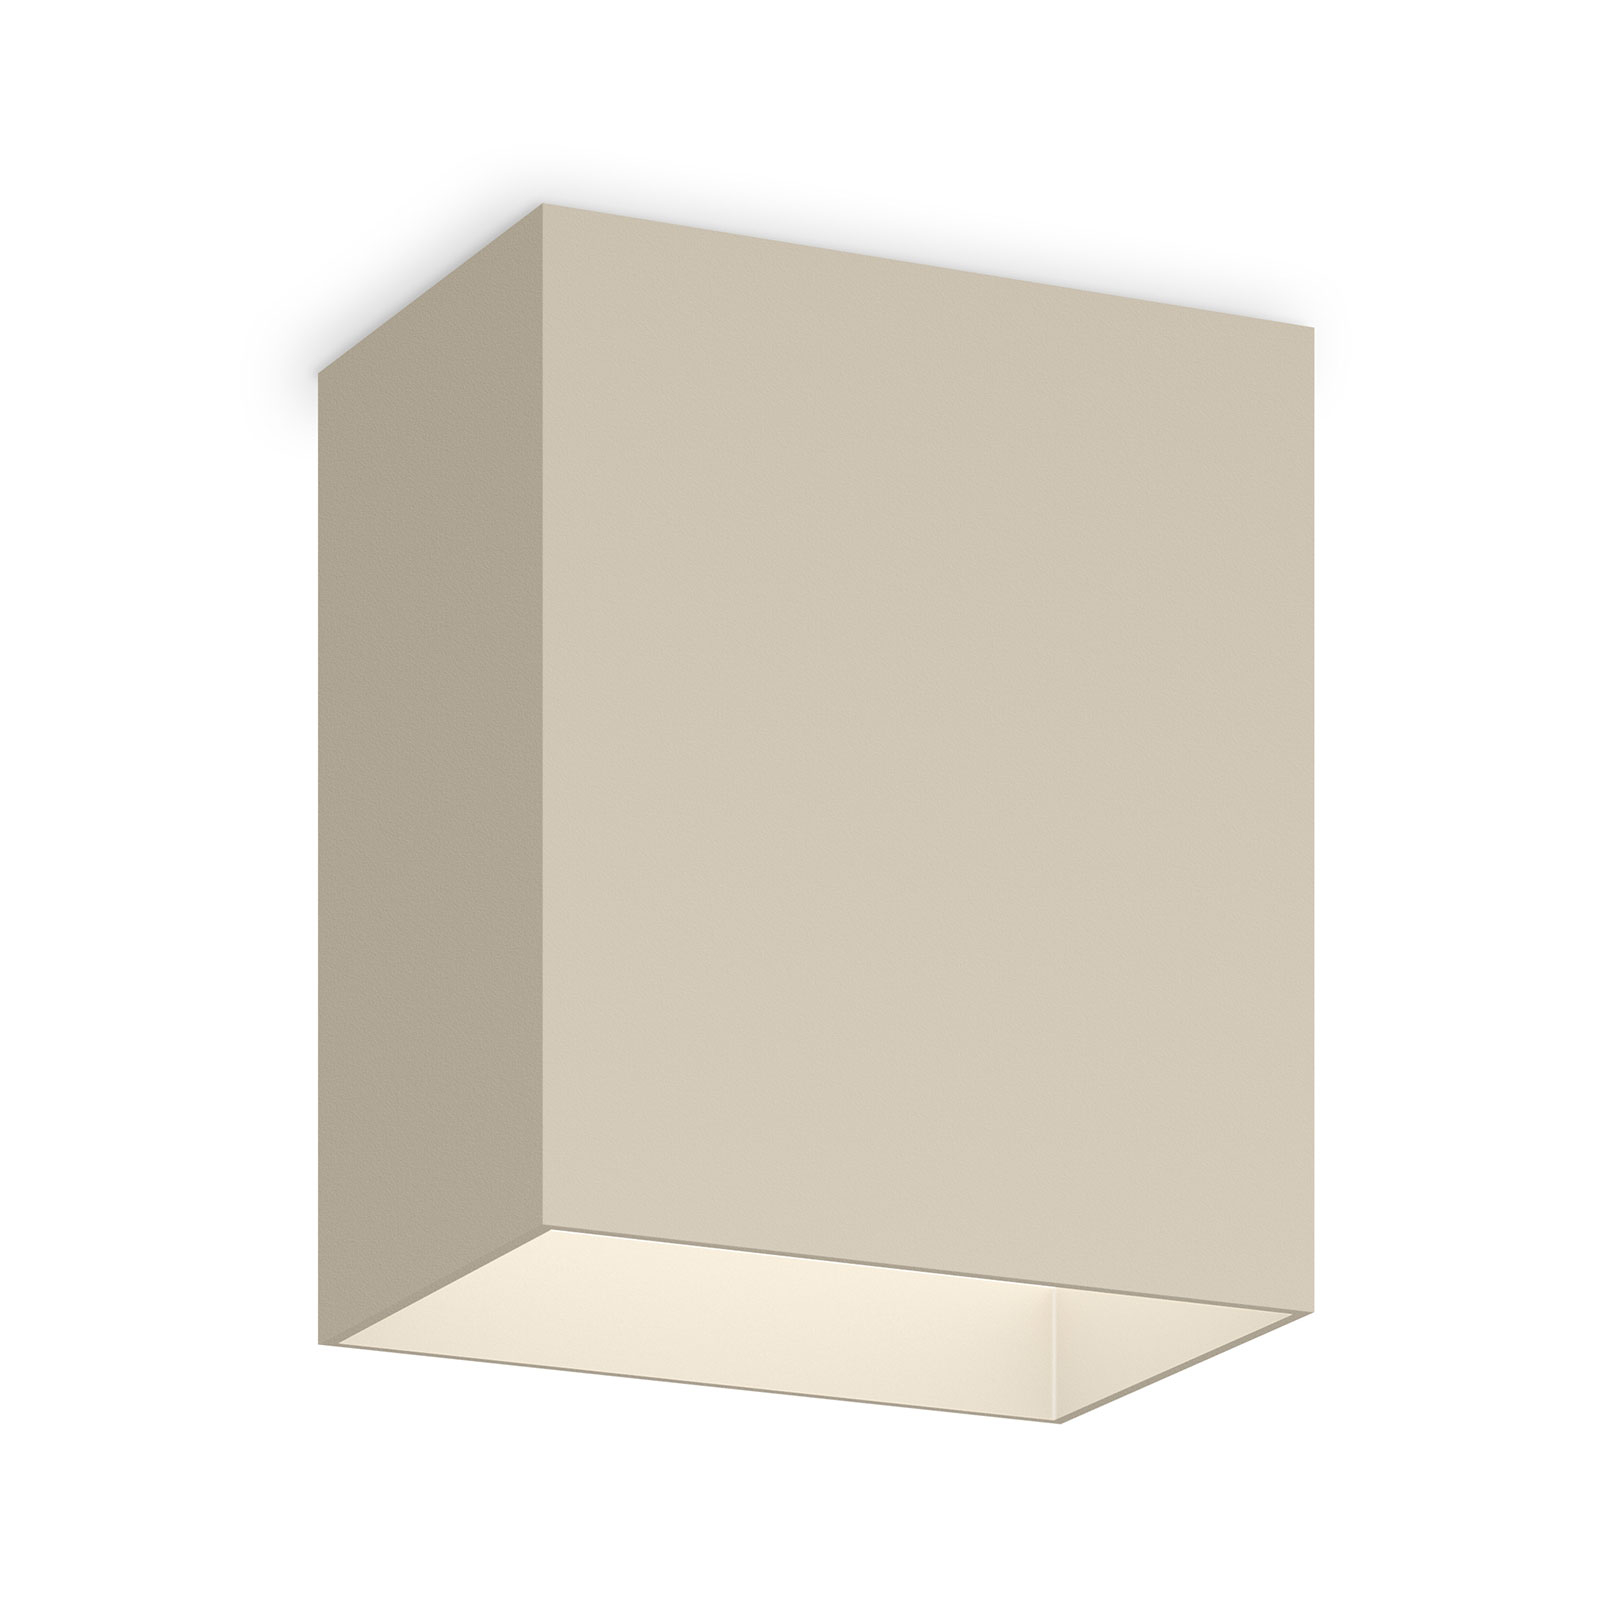 Vibia Structural 2630 plafondlamp 18cm, lichtgrijs